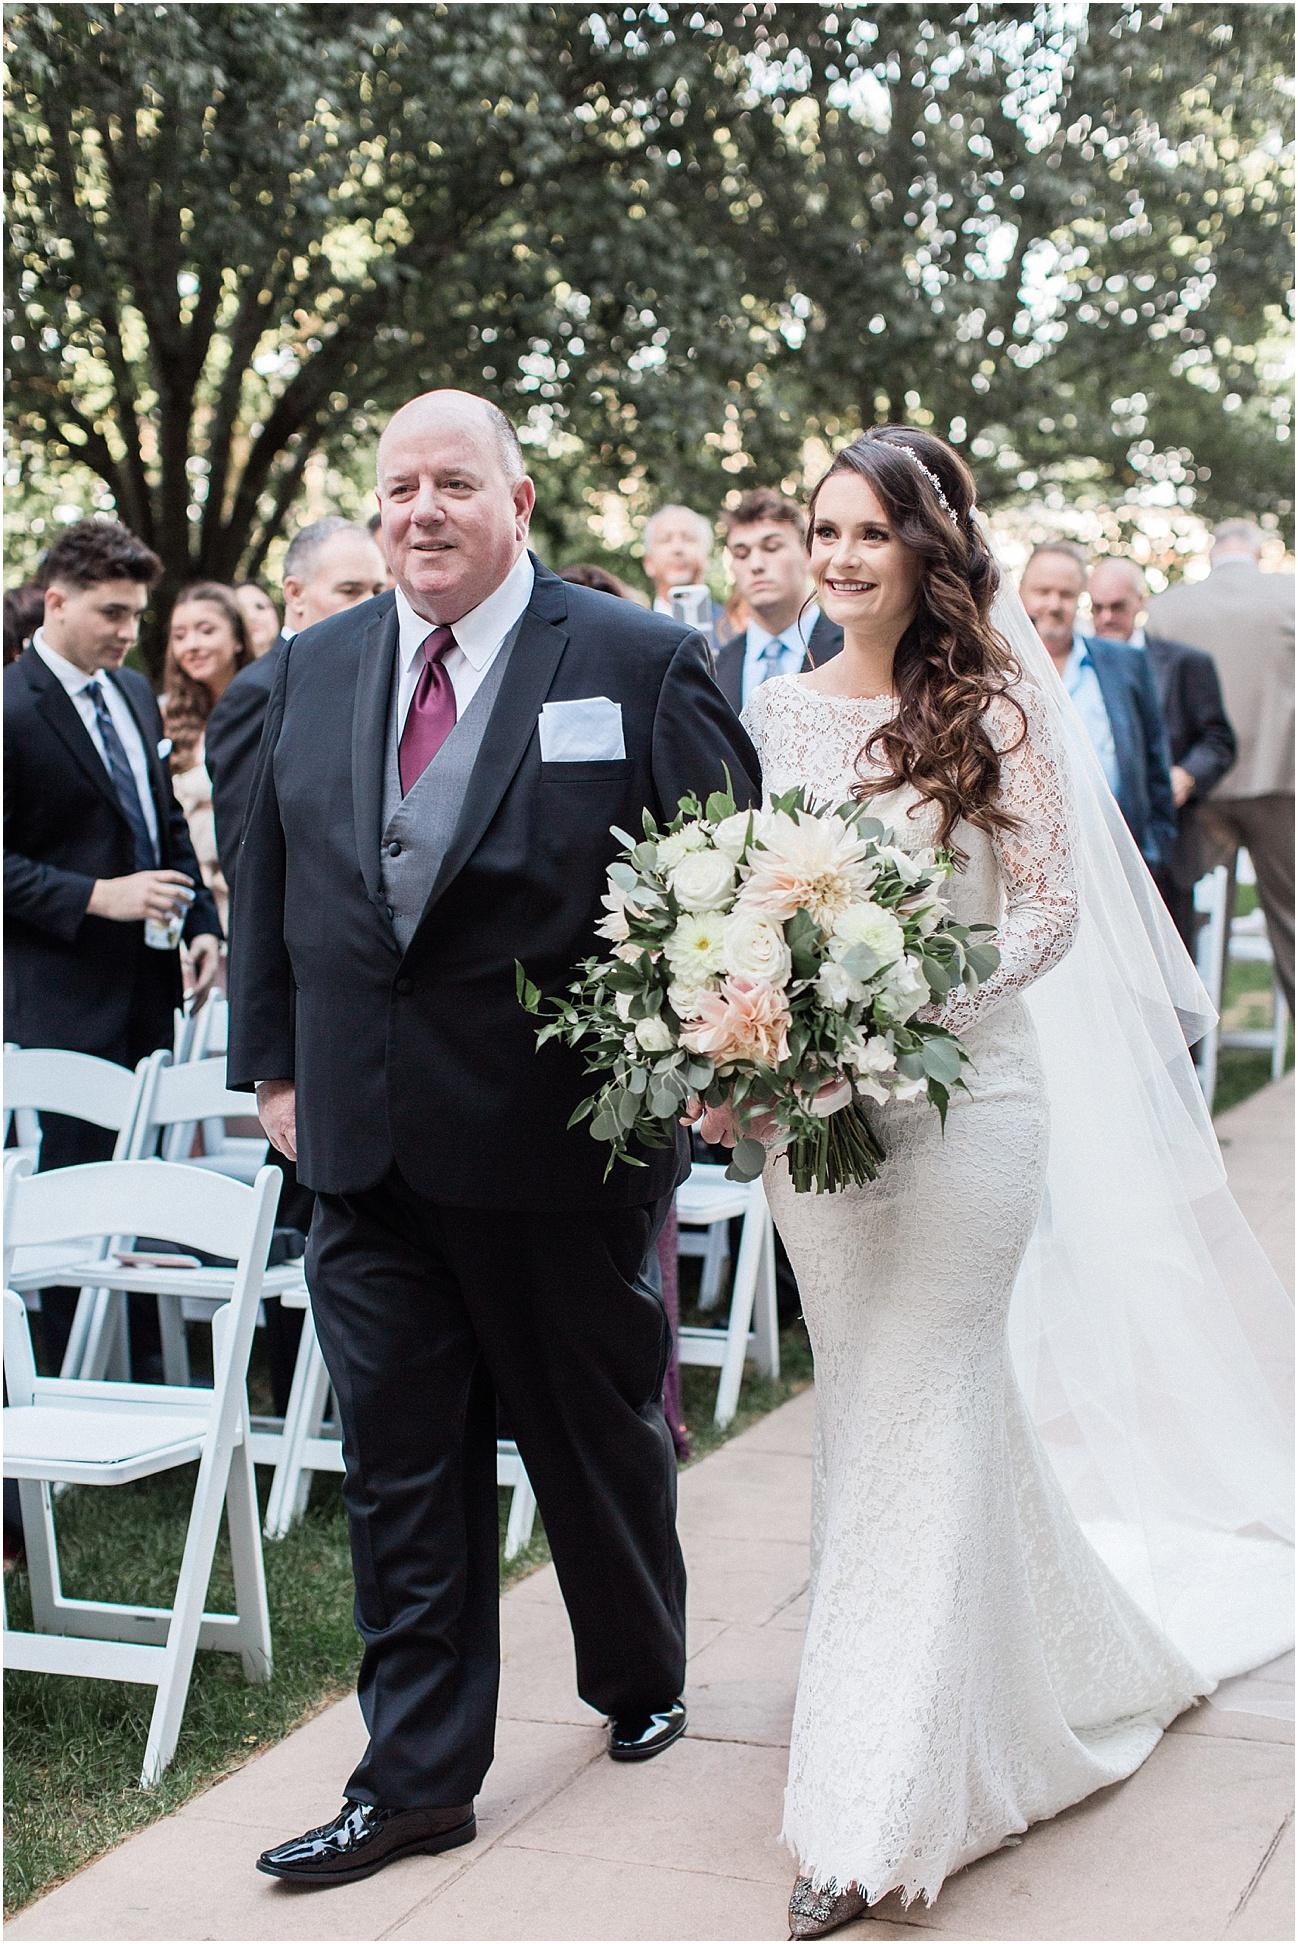 christina_frank_the_pavilion_at_pine_hills_fall_wine_cape_cod_boston_wedding_photographer_meredith_jane_photography_photo_1234.jpg